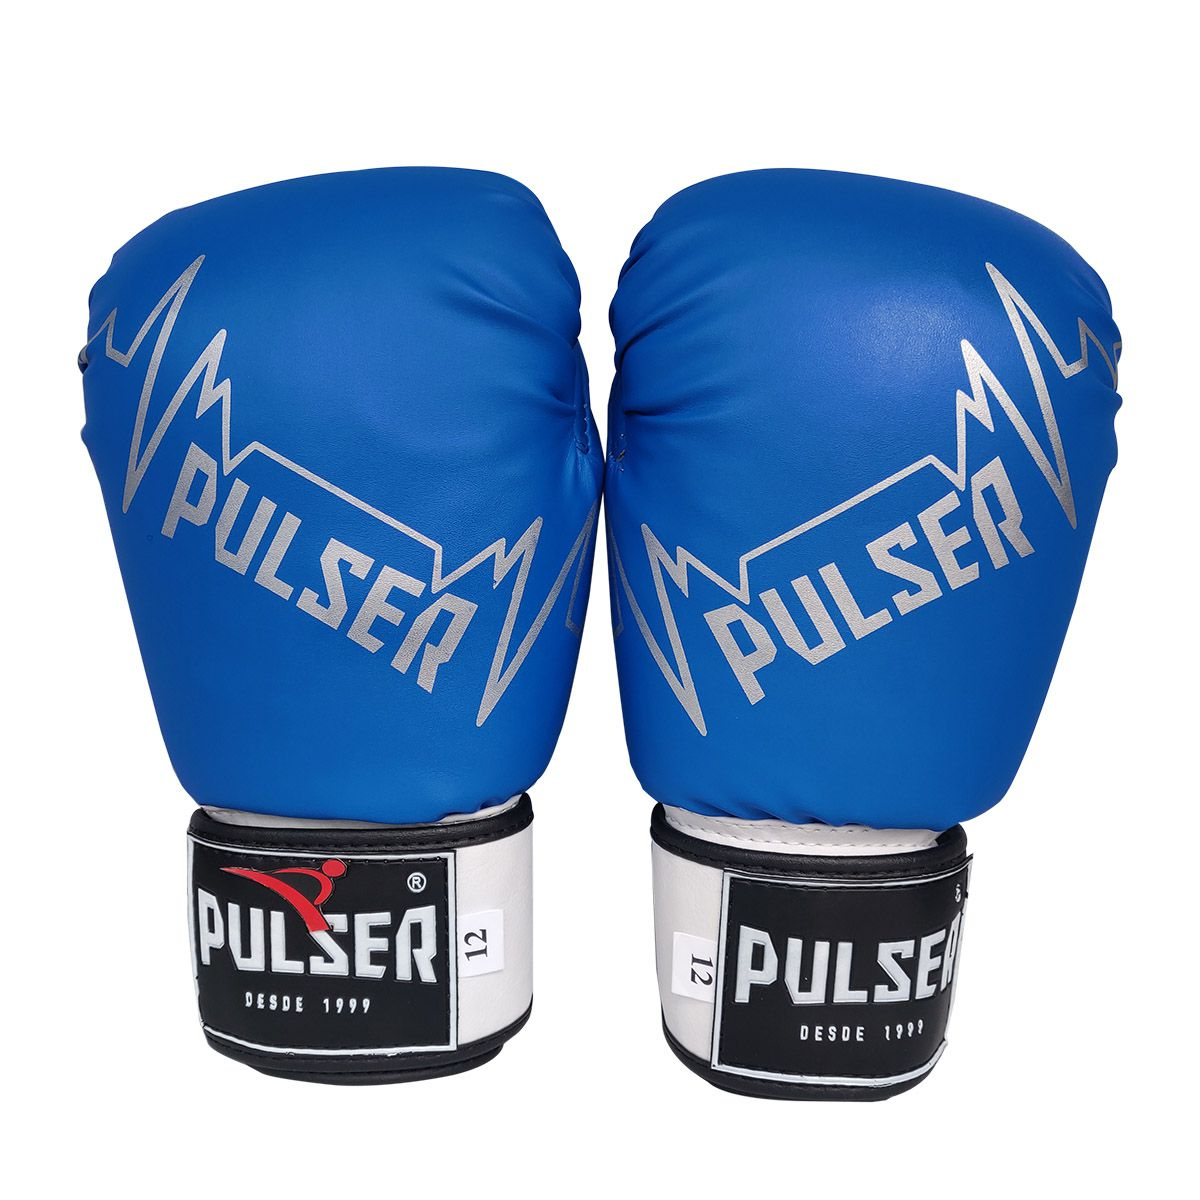 Kit de Muay Thai / Kickboxing 14oz - Preto e Azul Pulser Logo - Pulser  - PRALUTA SHOP